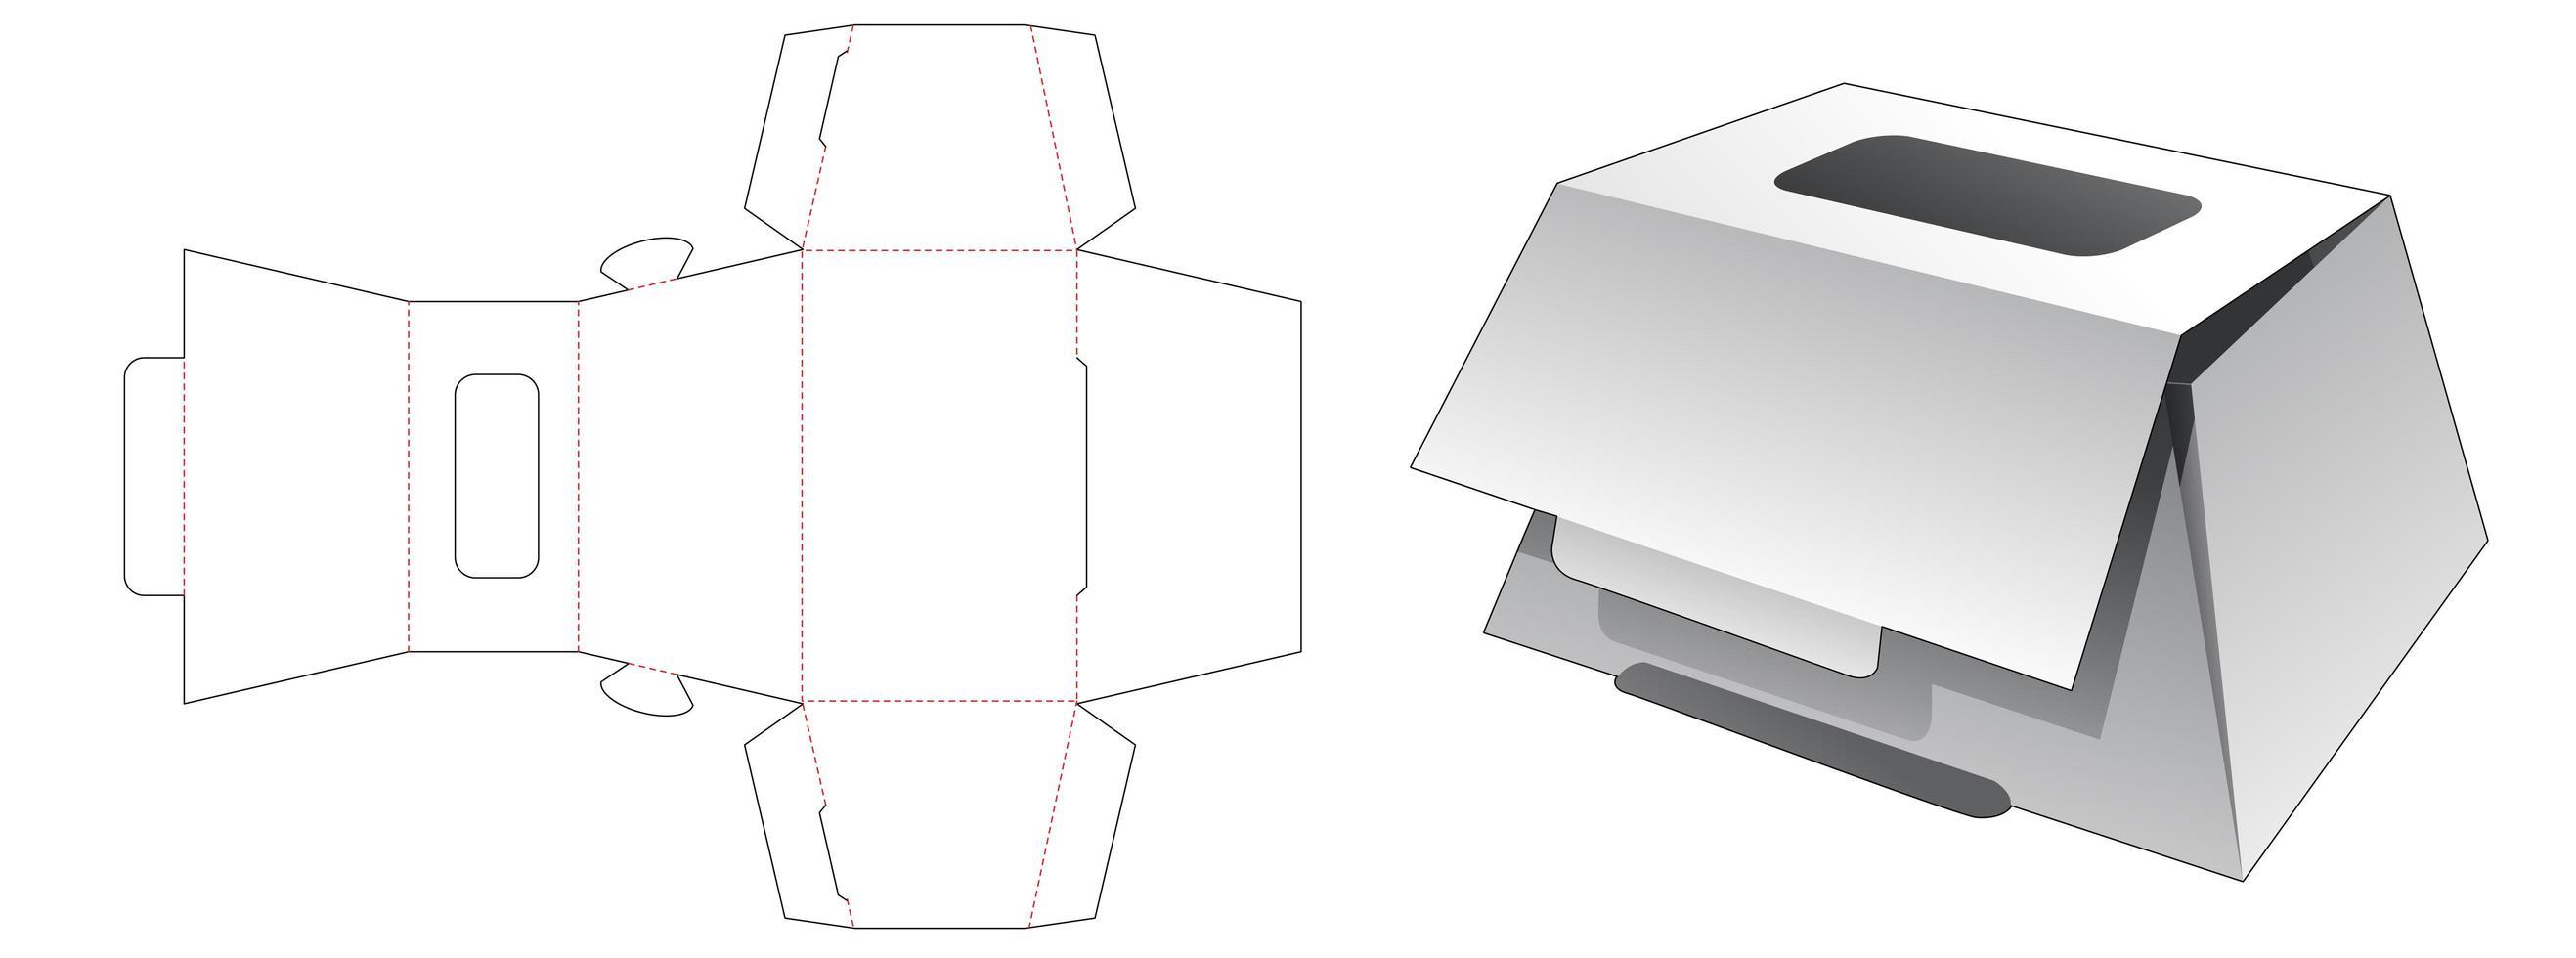 trapeziodformad bageri med toppfönster vektor